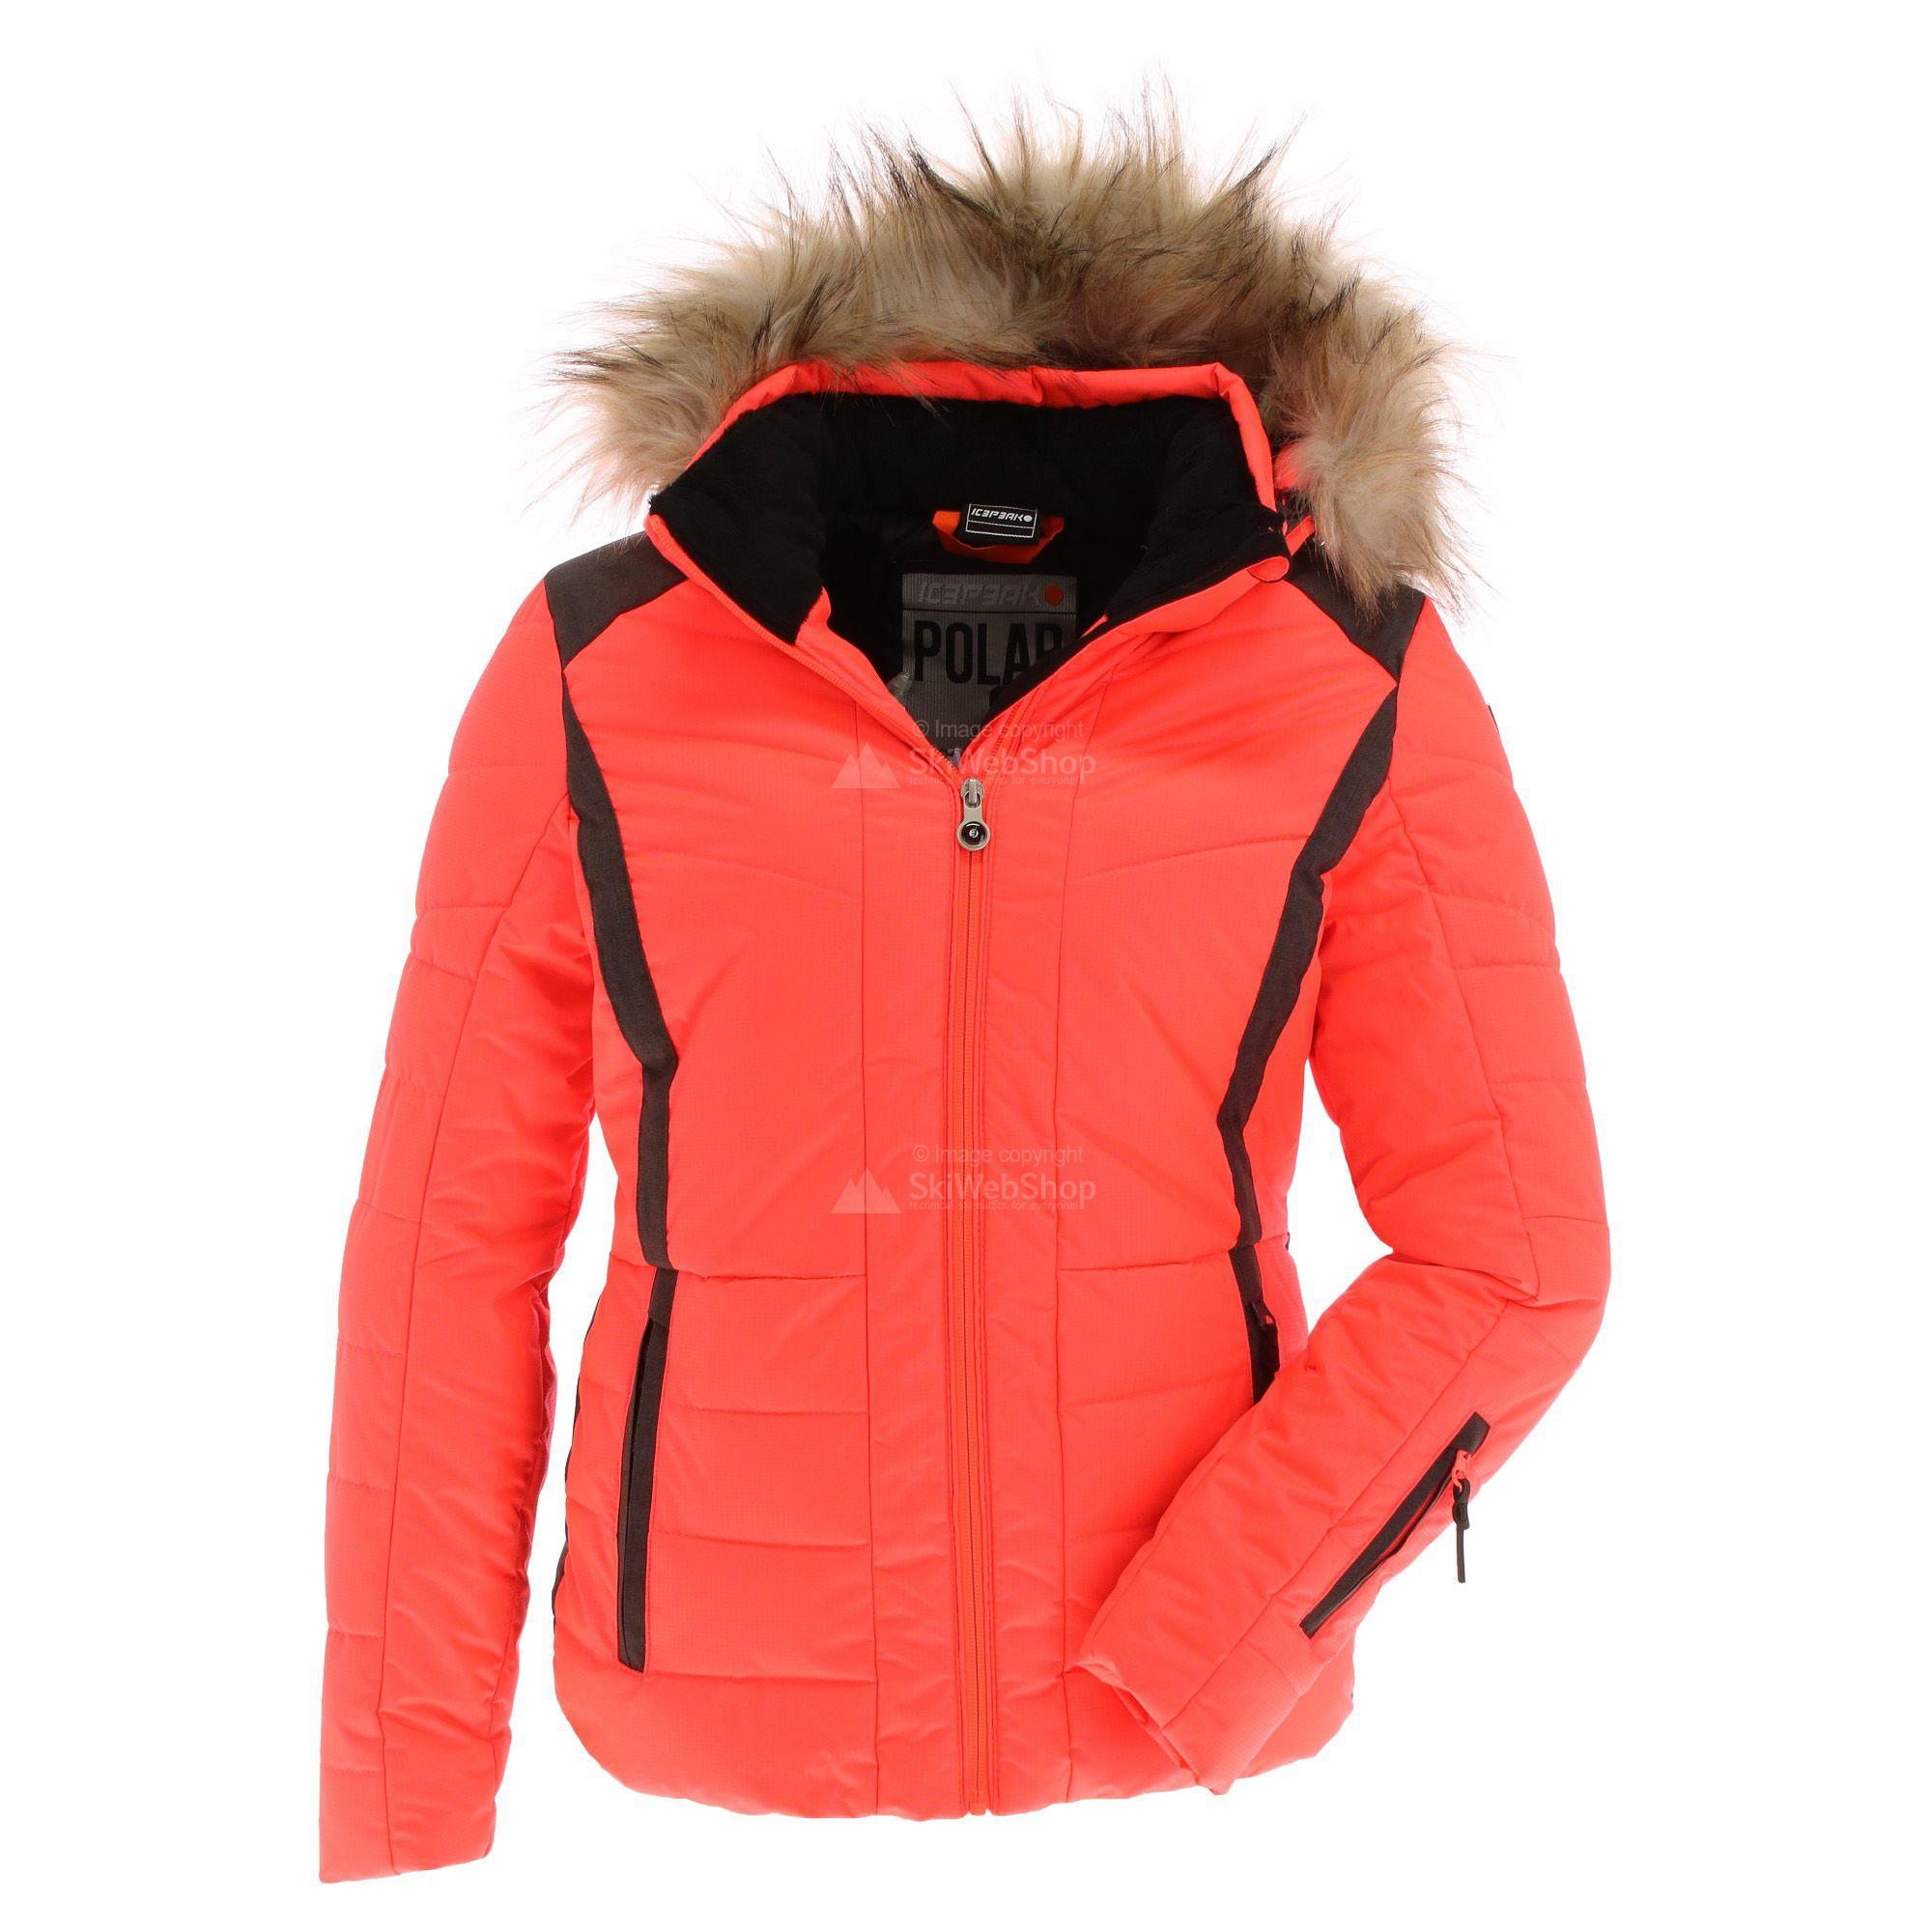 Icepeak, Cindy, ski jas, dames, hot roze • SkiWebShop